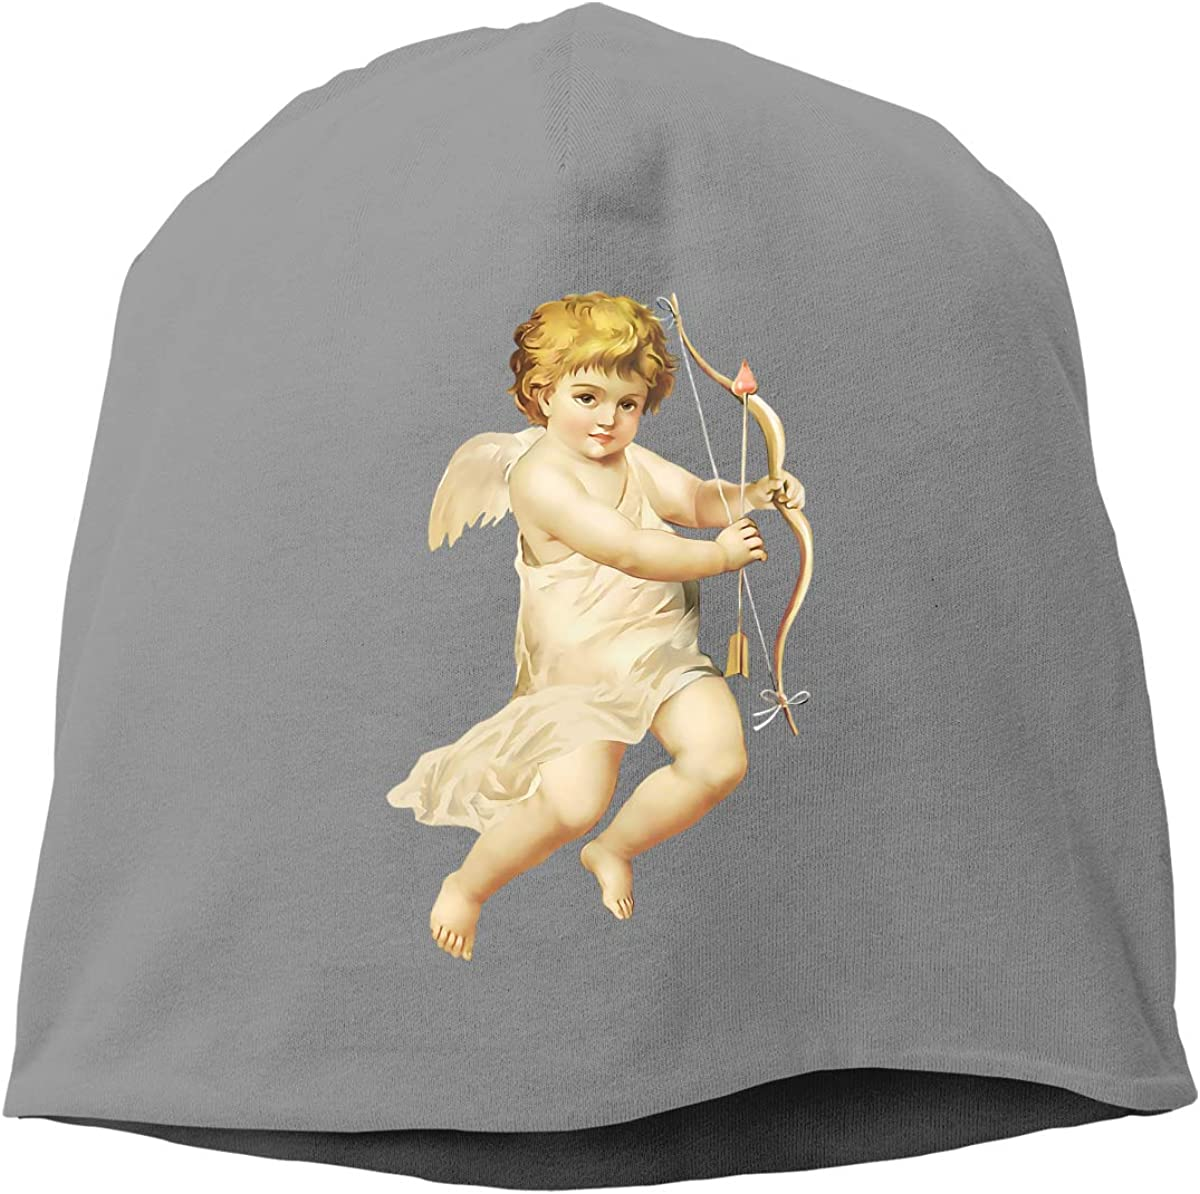 Unisex Beanie Cap Soft Stretch Daily Slouchy Beanies Skully Caps Deep Heather God of Love Cupid Trendy Warm Cuffed Skull Knit Hat